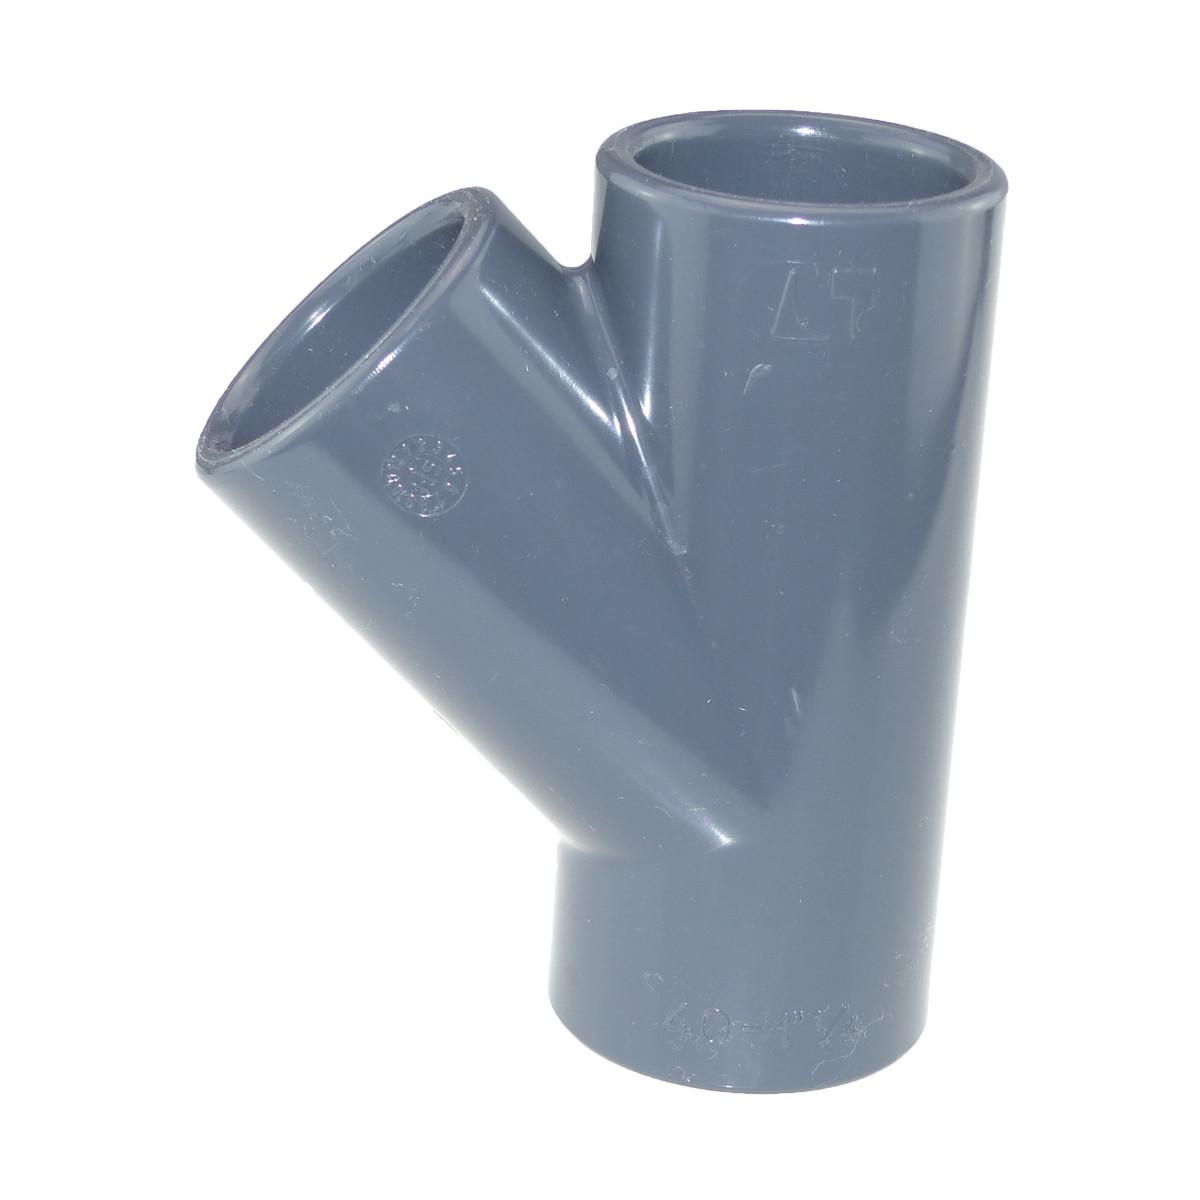 Cepex/Plimat/CH PVC T-Stck 45 Grad Klebemuffe 20 mm